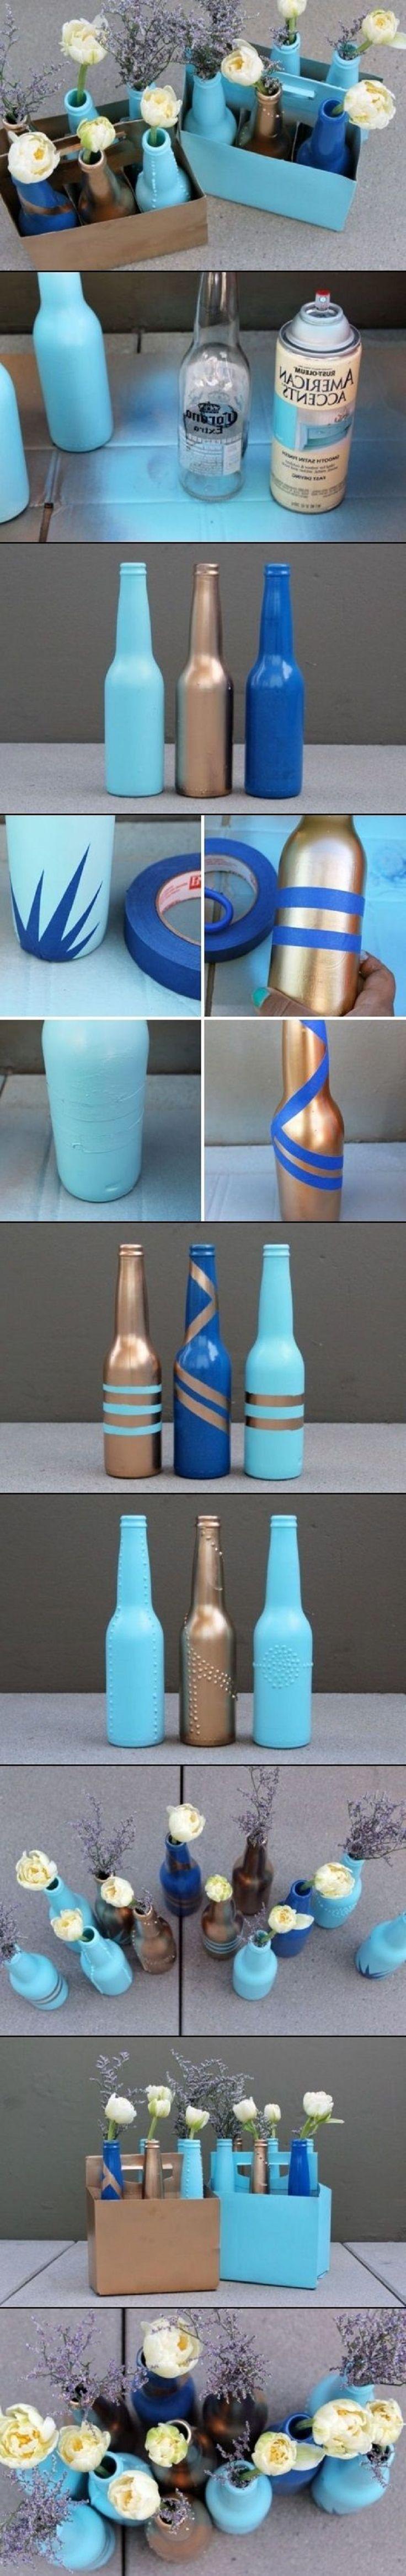 23+ Fascinating Ways To Reuse Glass Bottles Into DIY ...